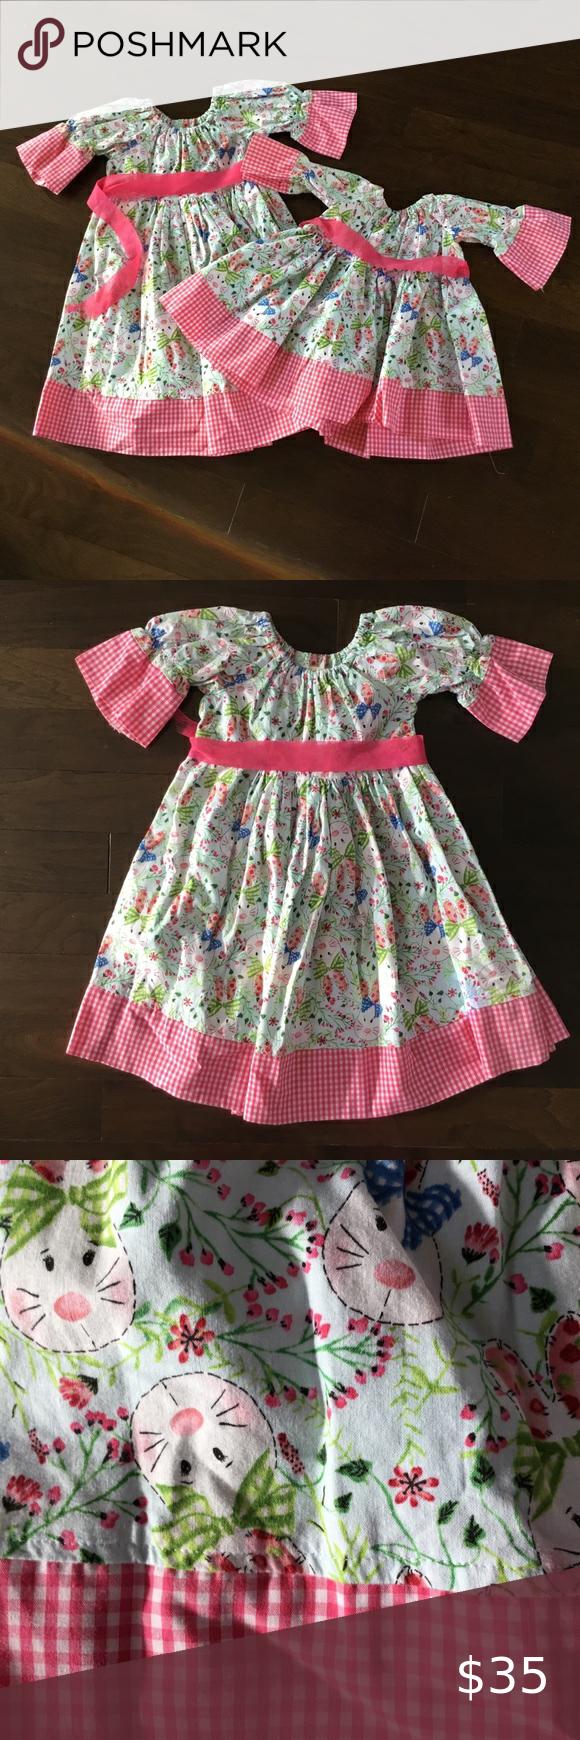 Handmade Easter Bunny Spring Pink Green Dress 4t In 2020 Pink And Green Dress Green Dress Dresses [ 1740 x 580 Pixel ]